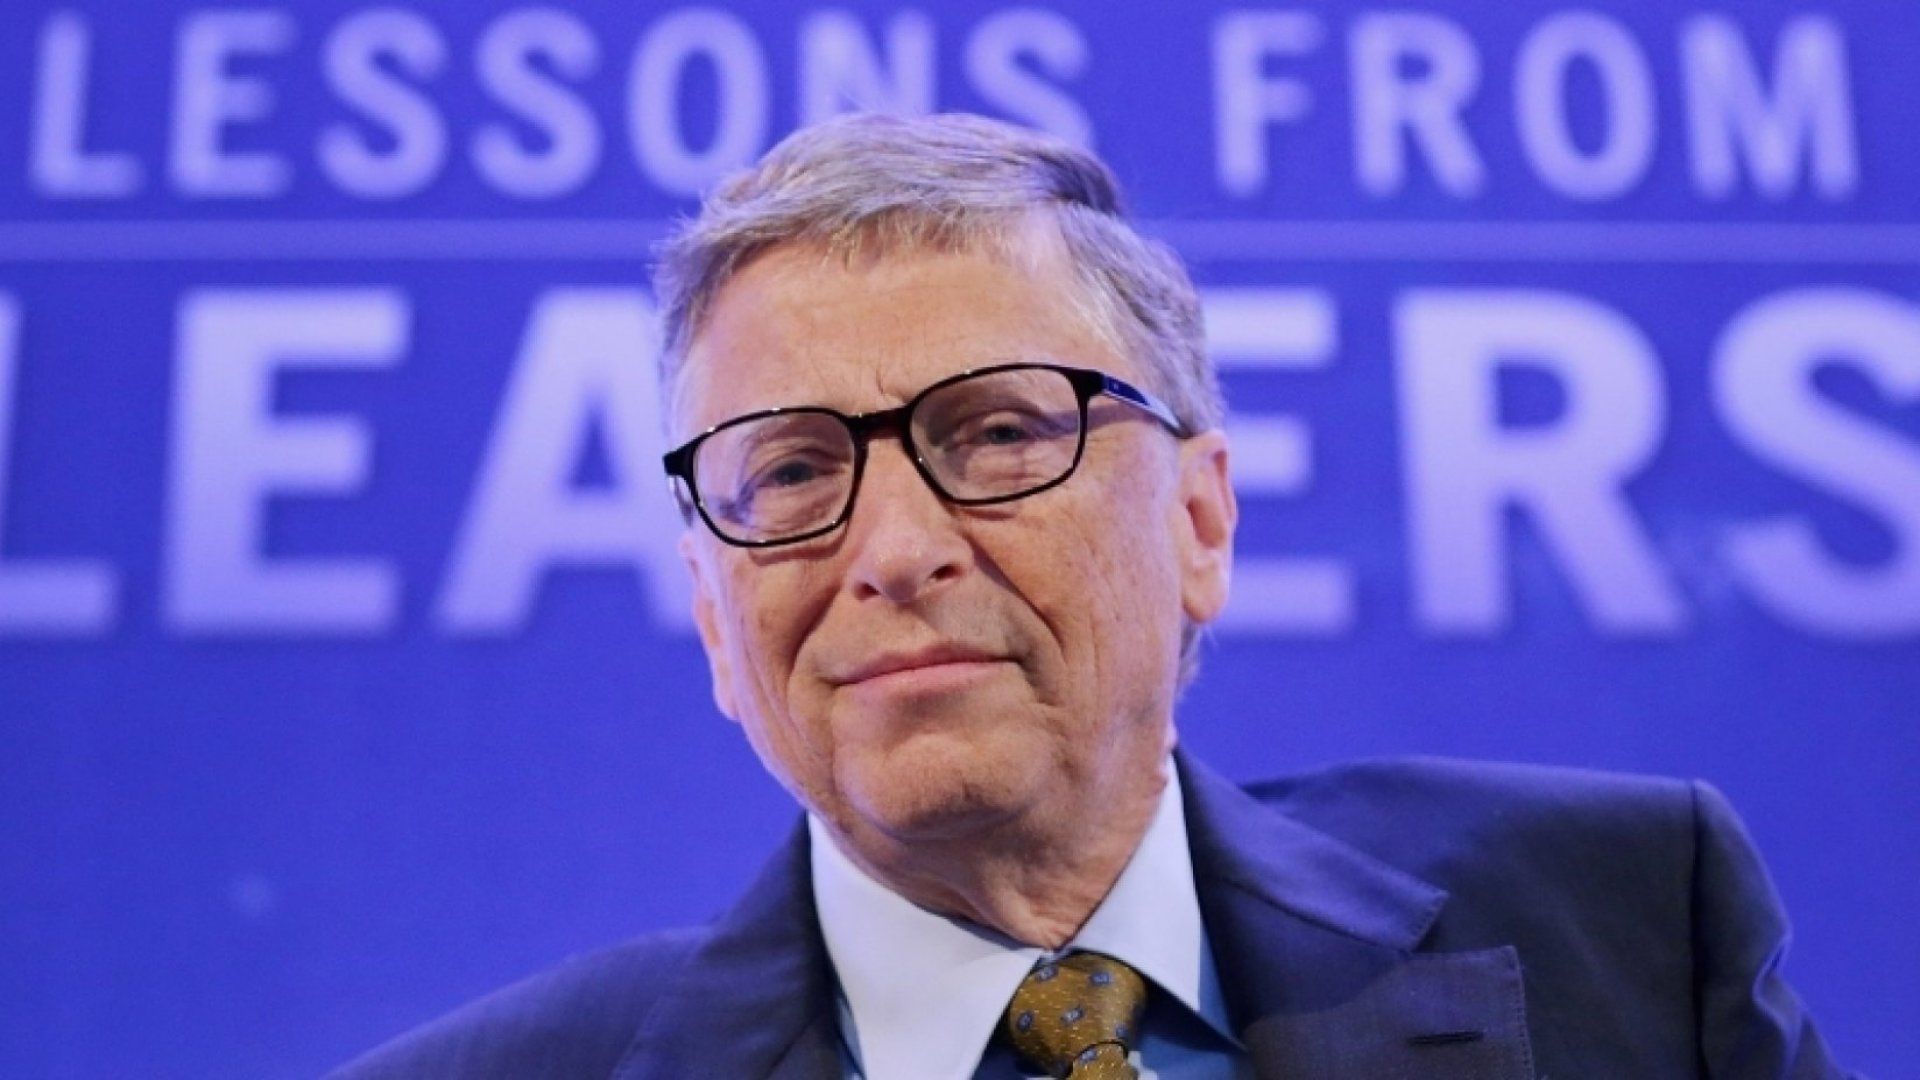 20 Brilliant Quotes from Billionaire Entrepreneurs